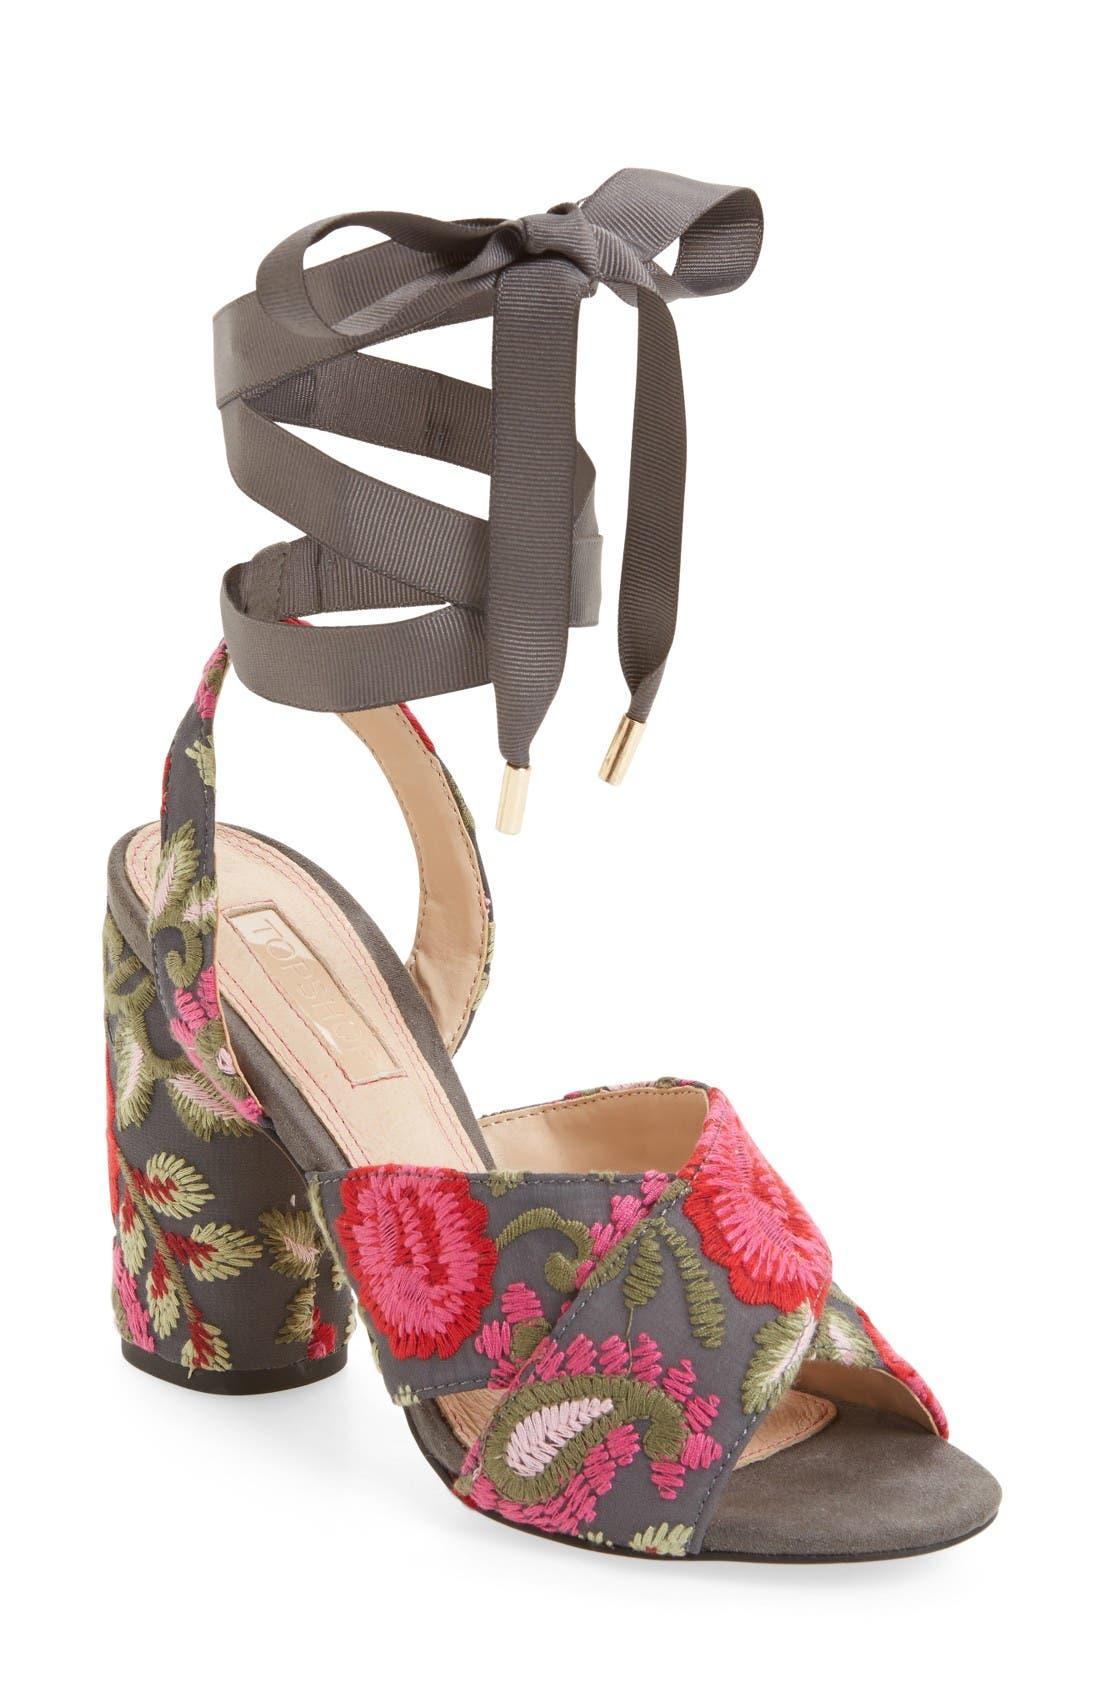 TOPSHOP Reena Embroidered Sandal